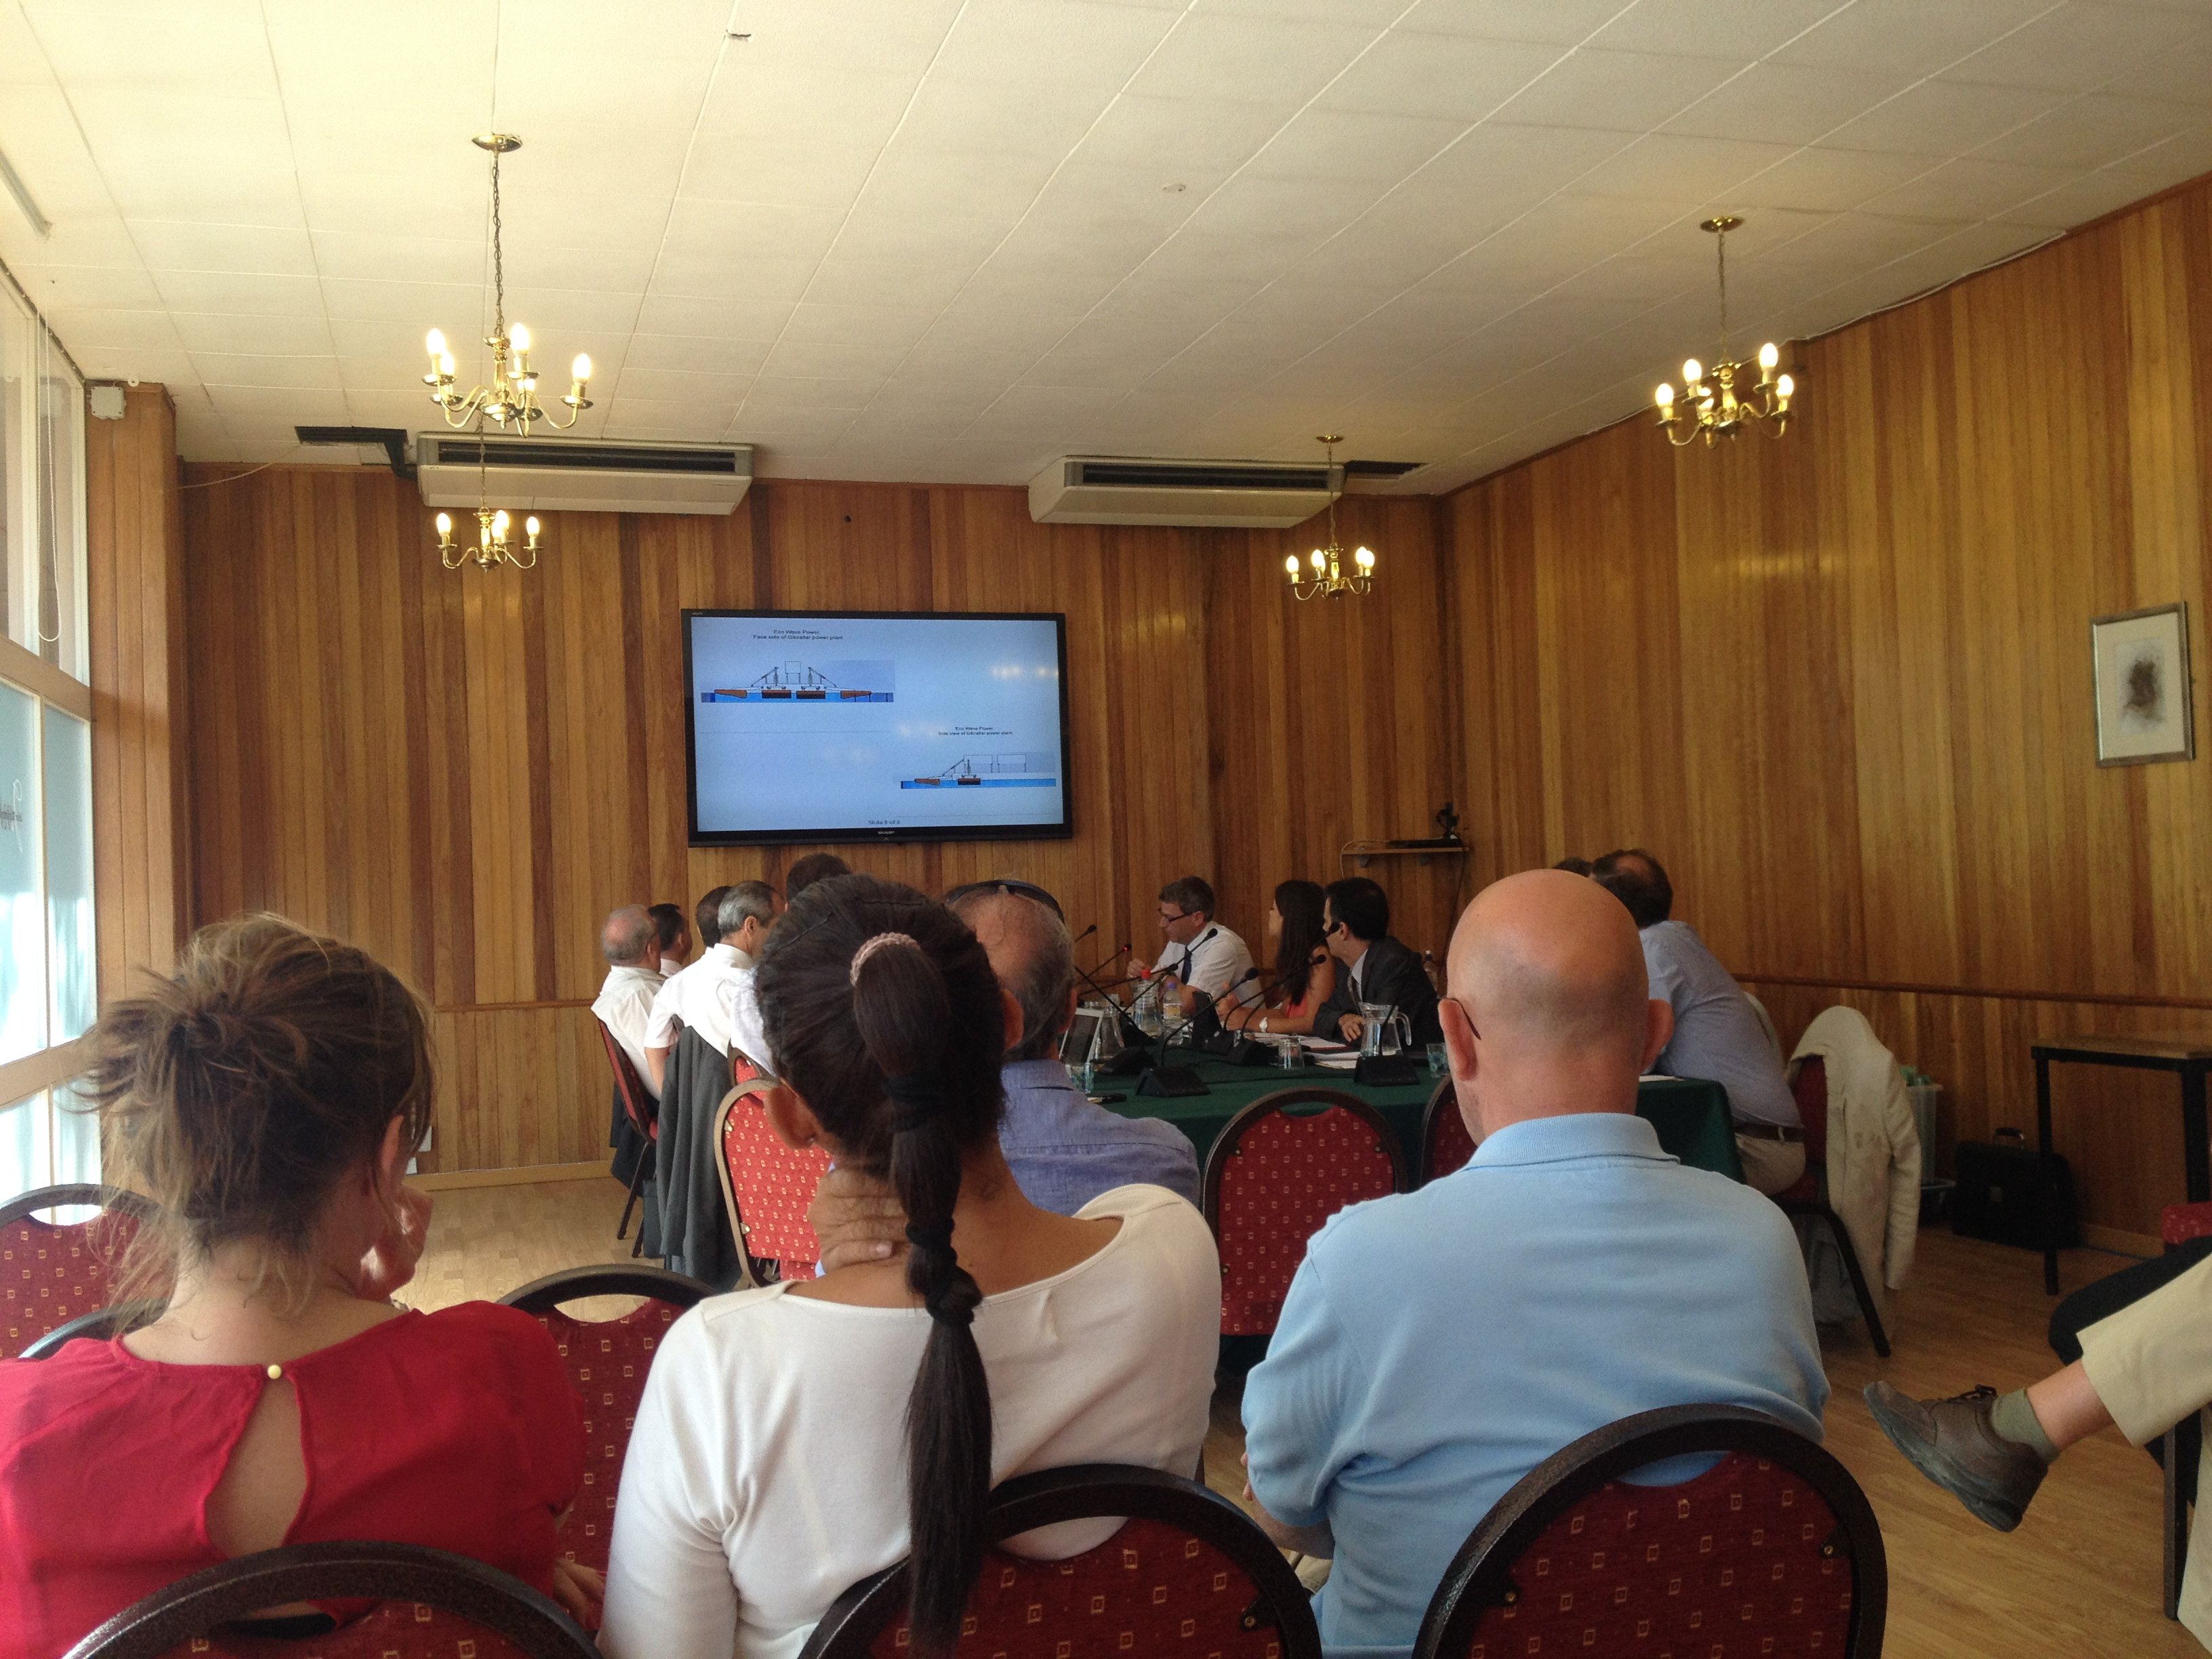 Jul 24 - DPC Discusses Inaugural Wave Generator for Gibraltar